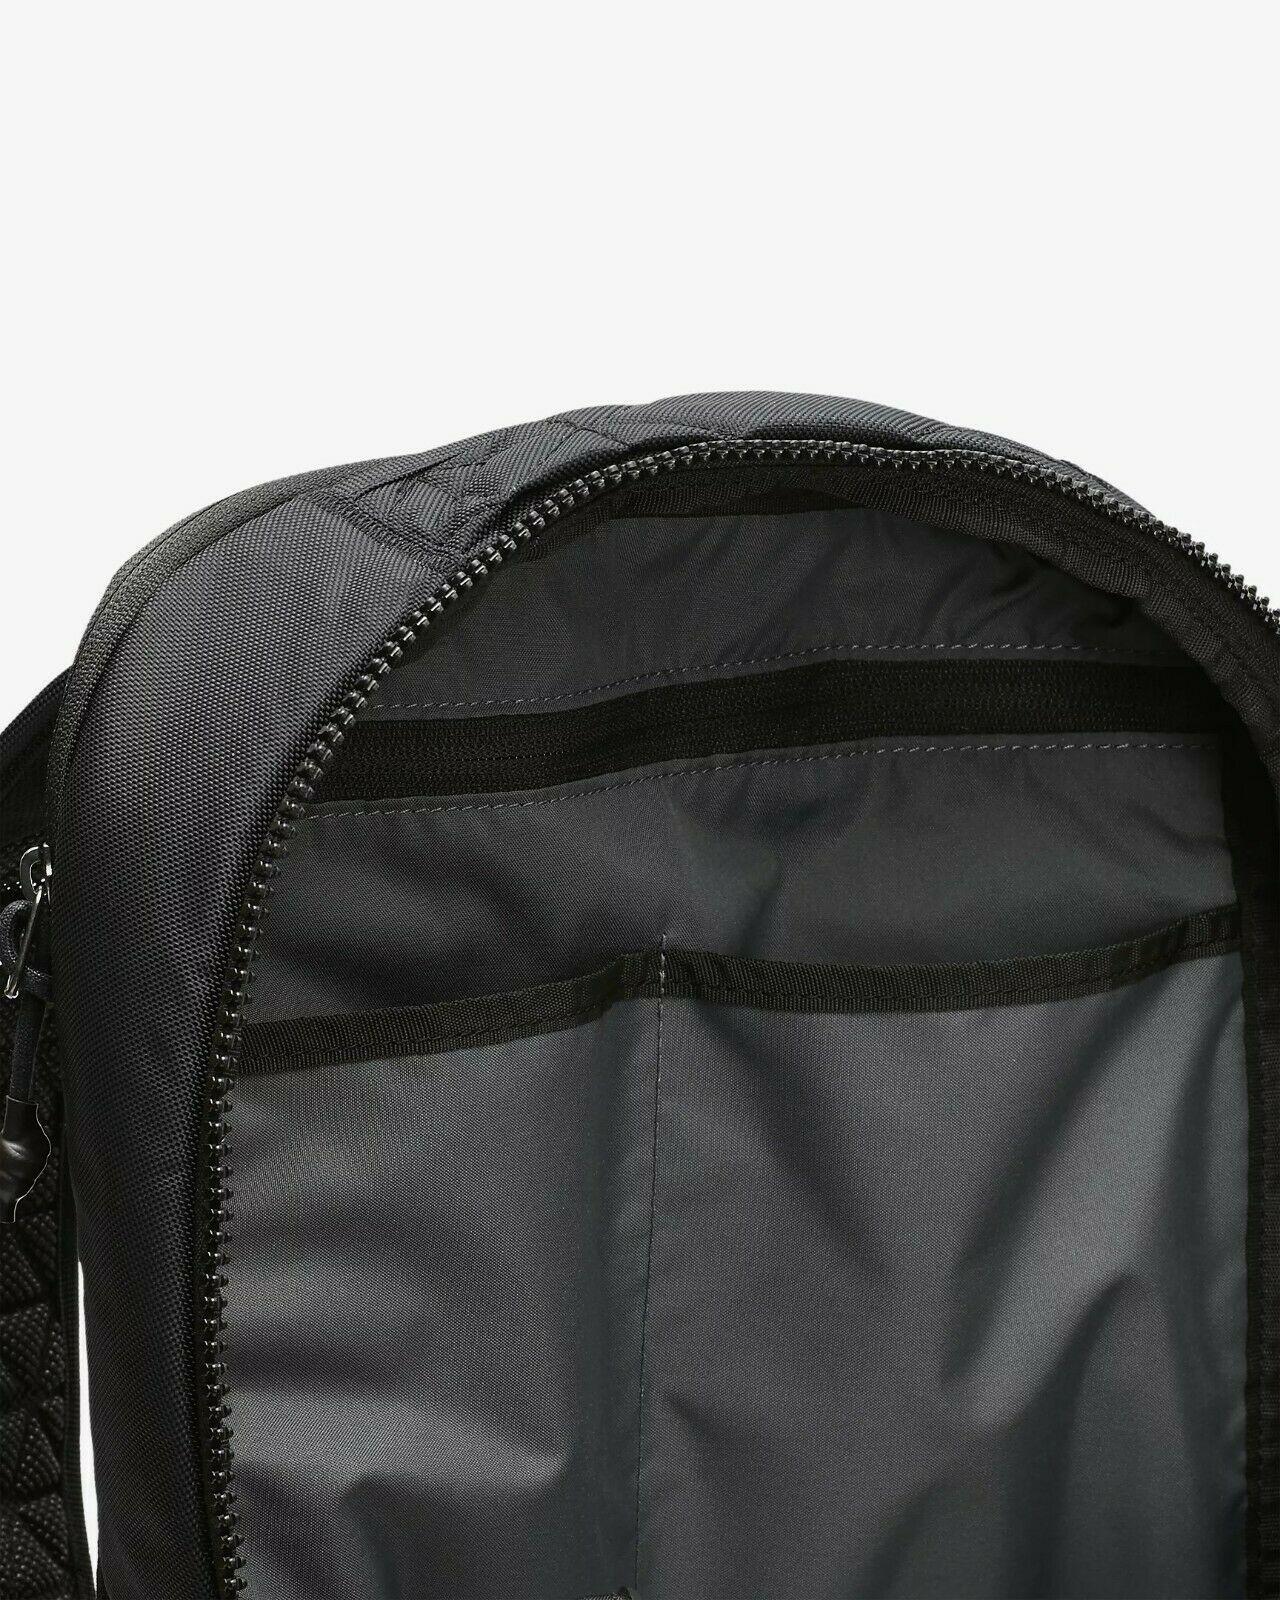 Nike Vapor Power 2.0 Training Backpack, BA5539 010 Black/Black/Black image 8